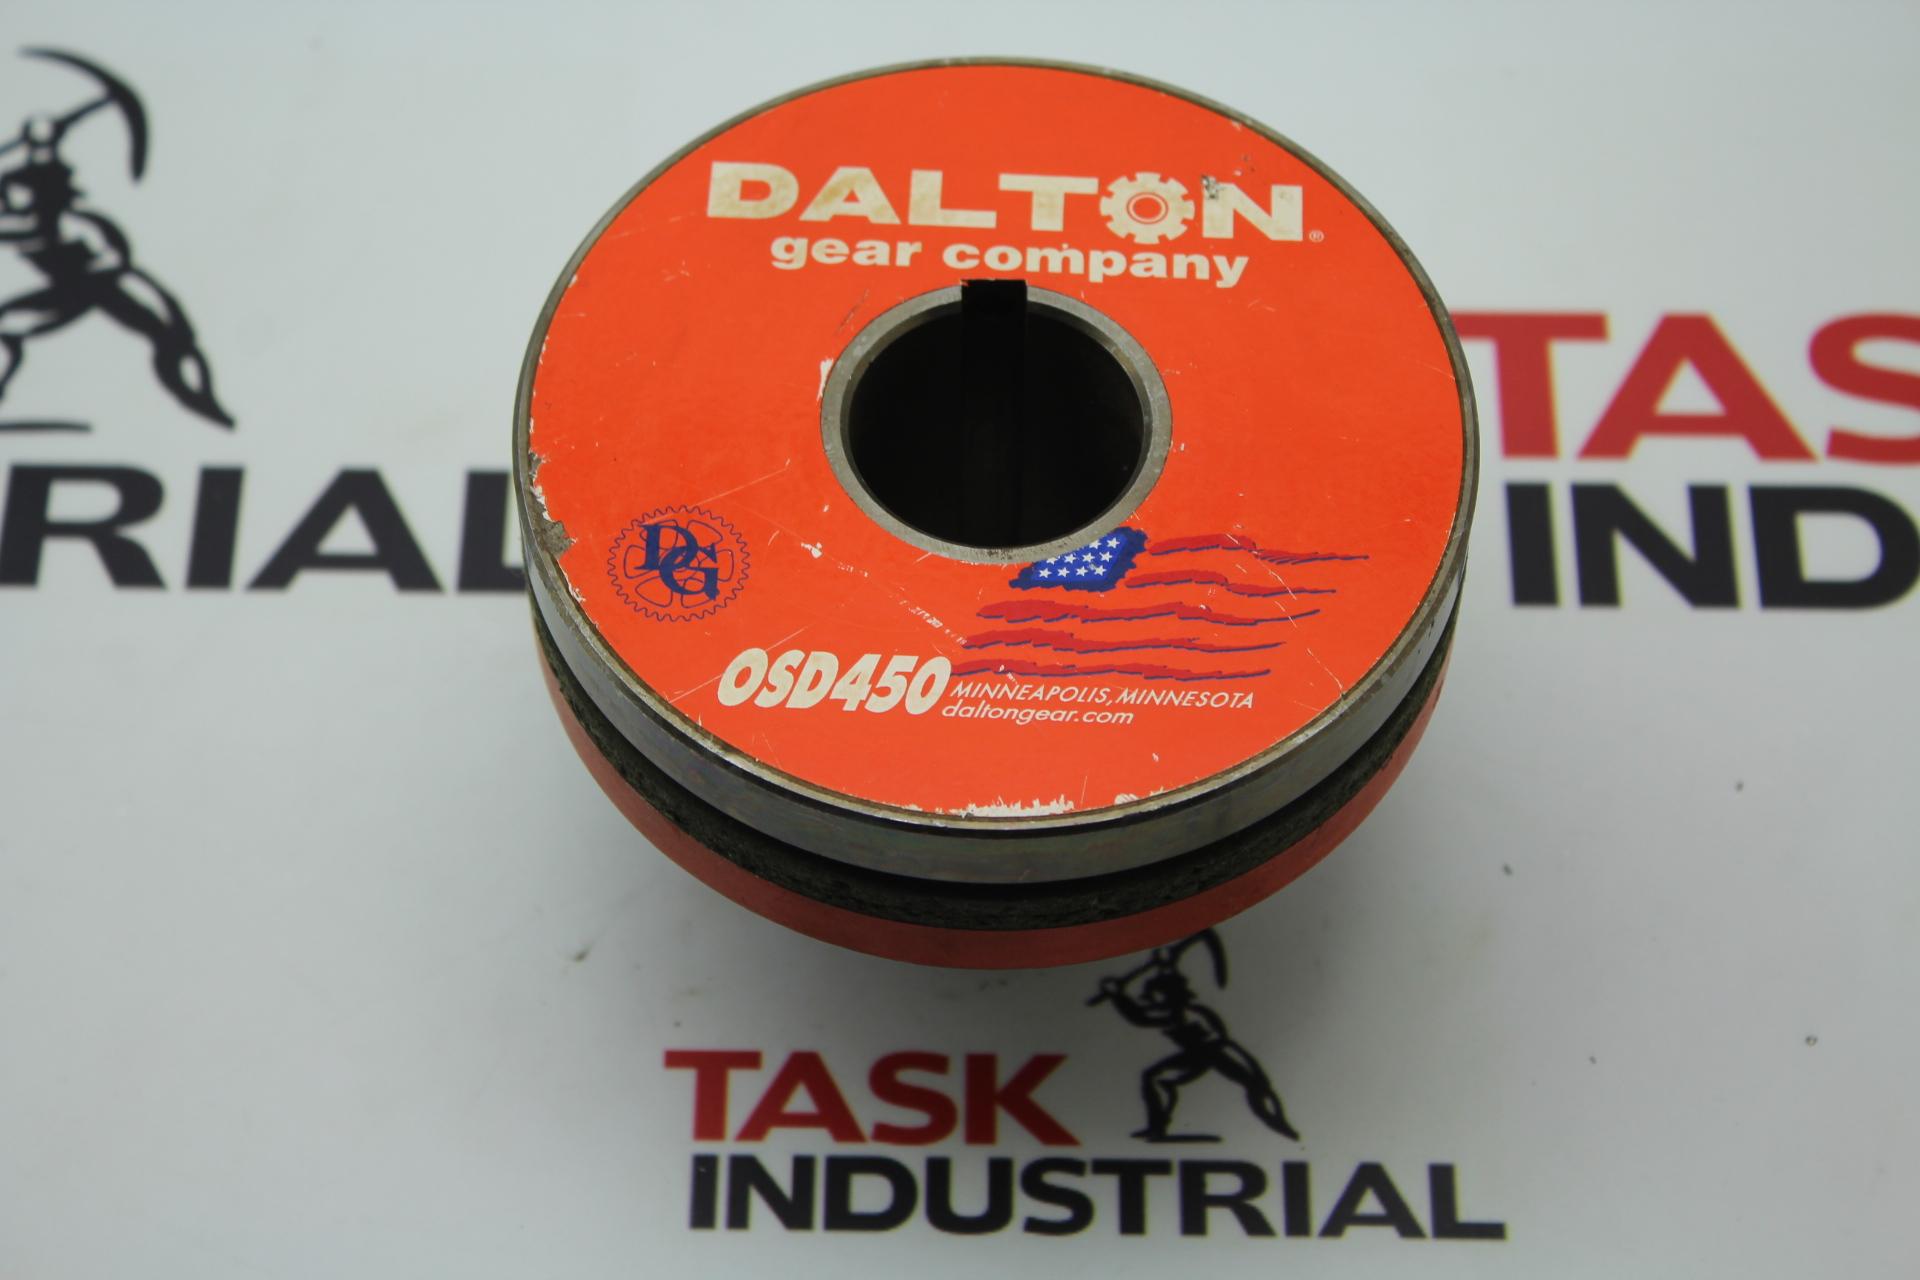 Dalton Gear Company OSD450